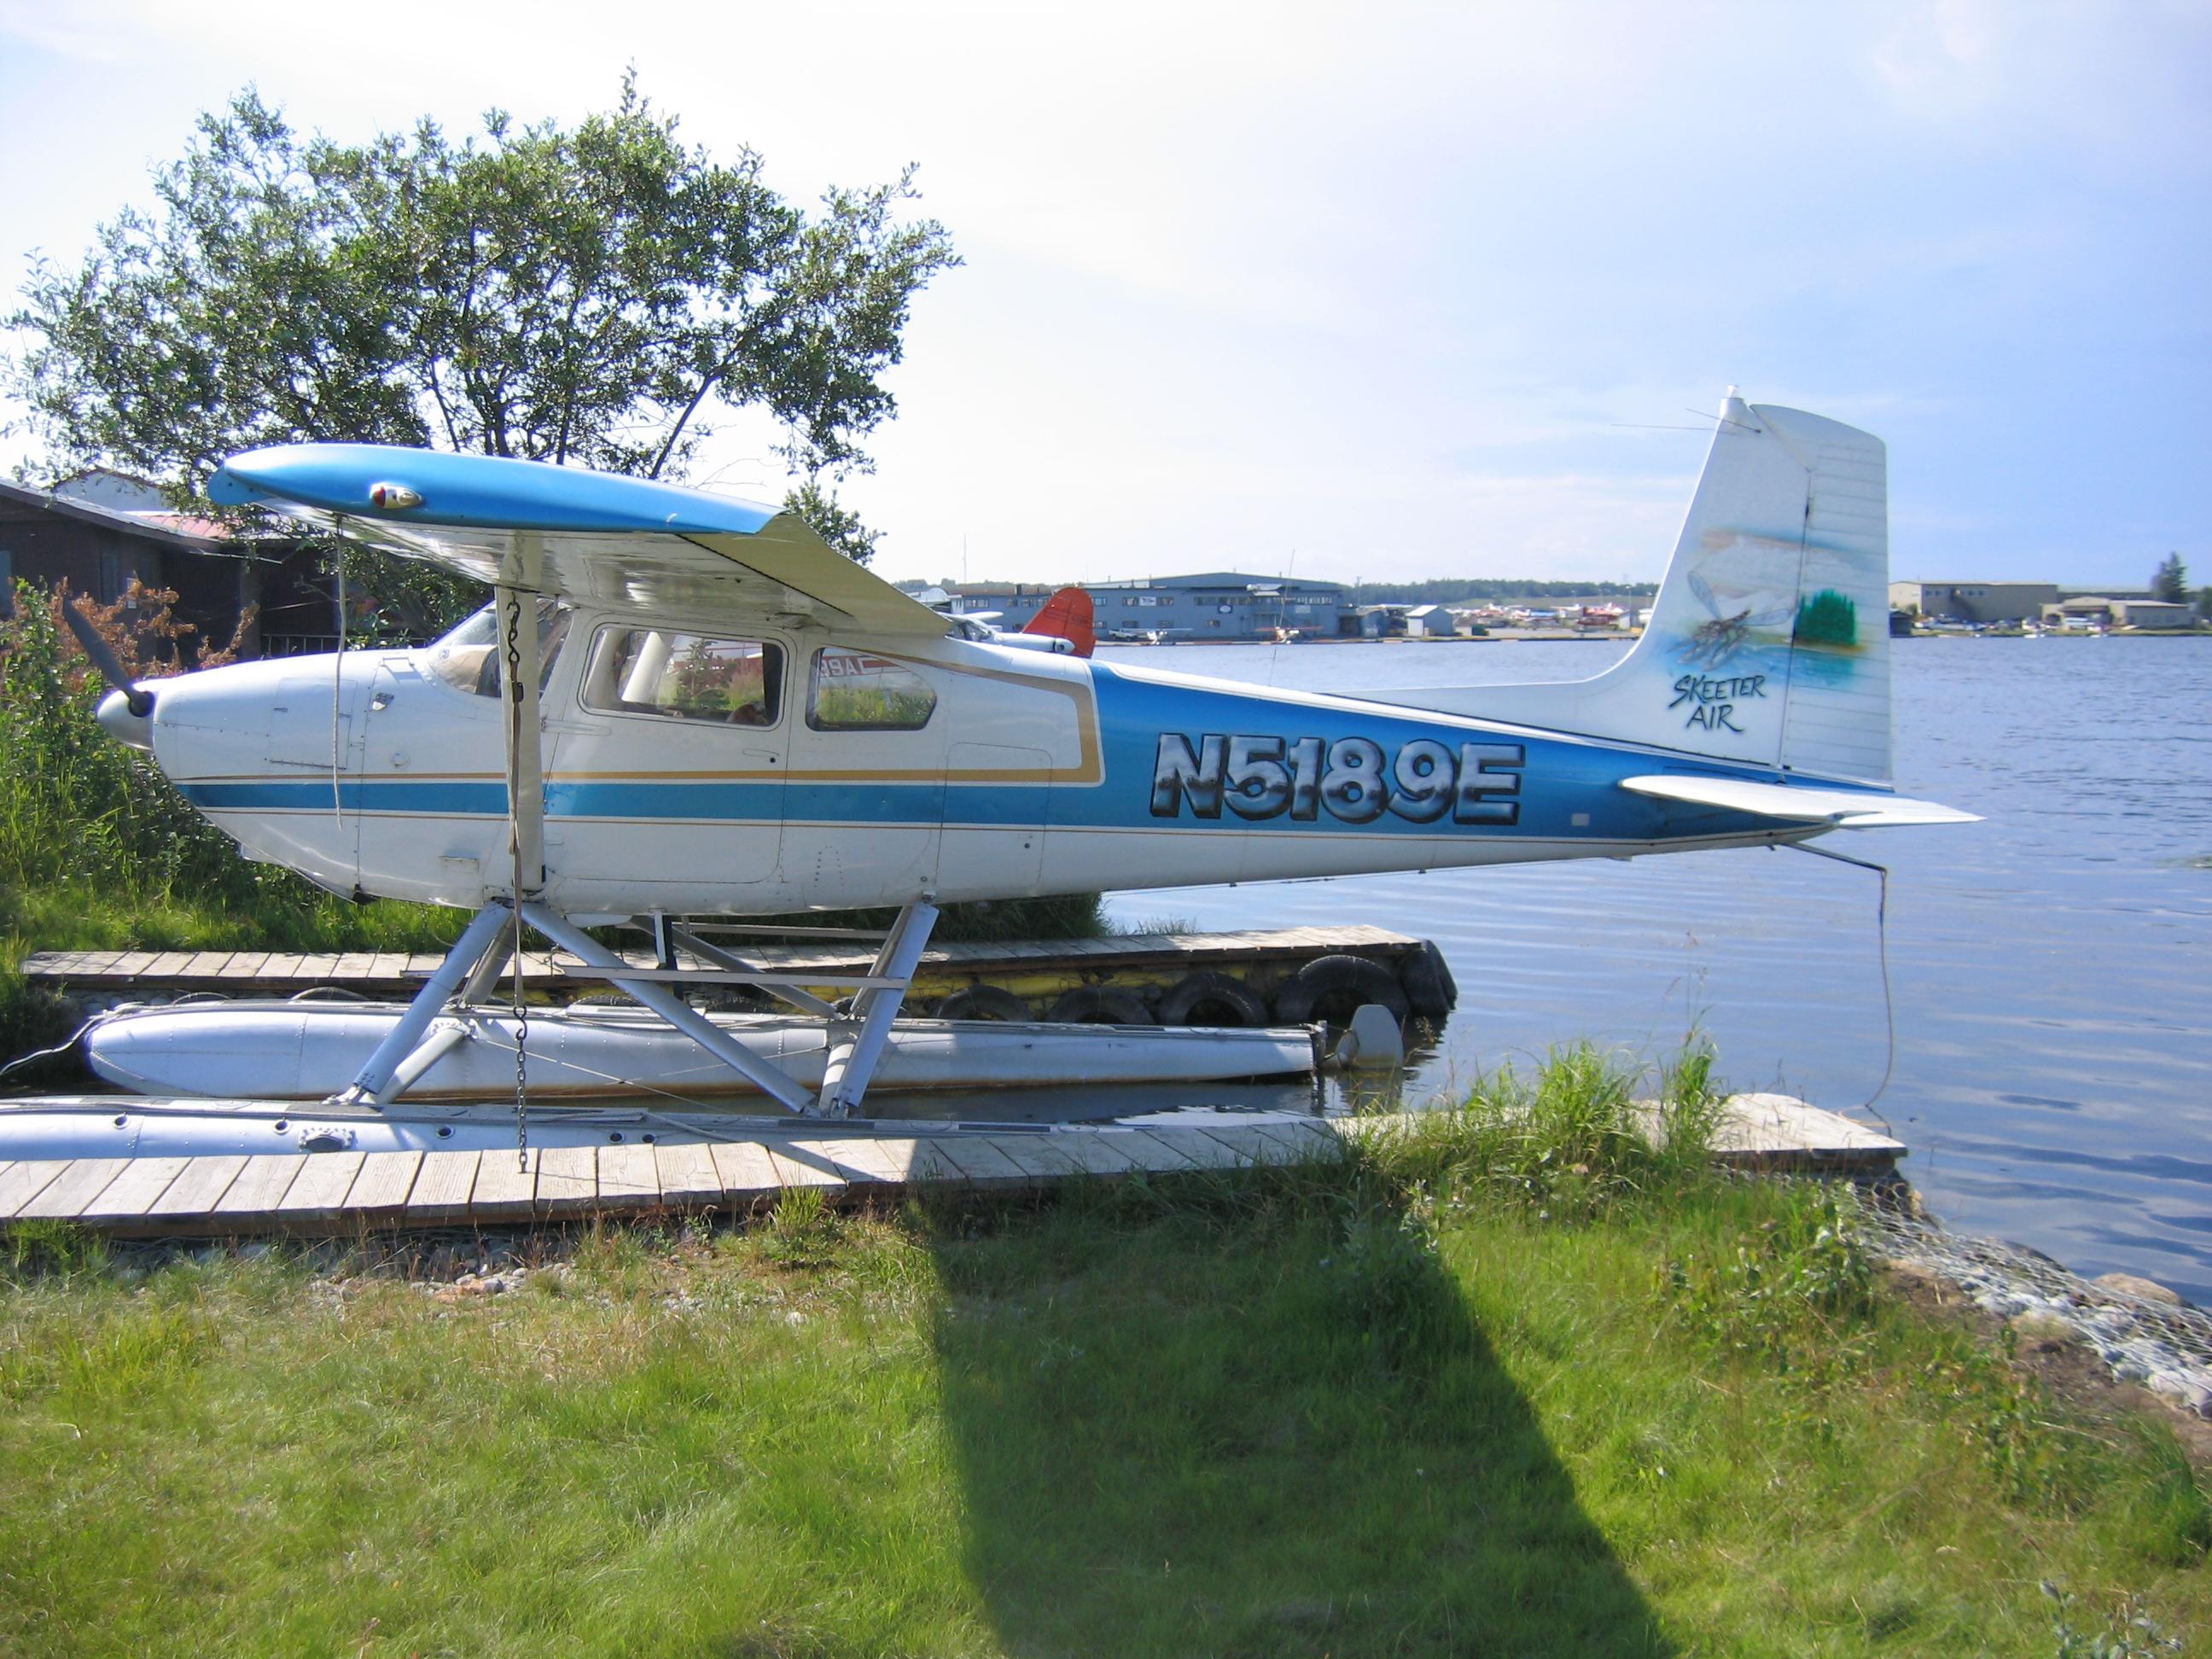 File:Cessna-180B-N5189E JPG - Wikimedia Commons